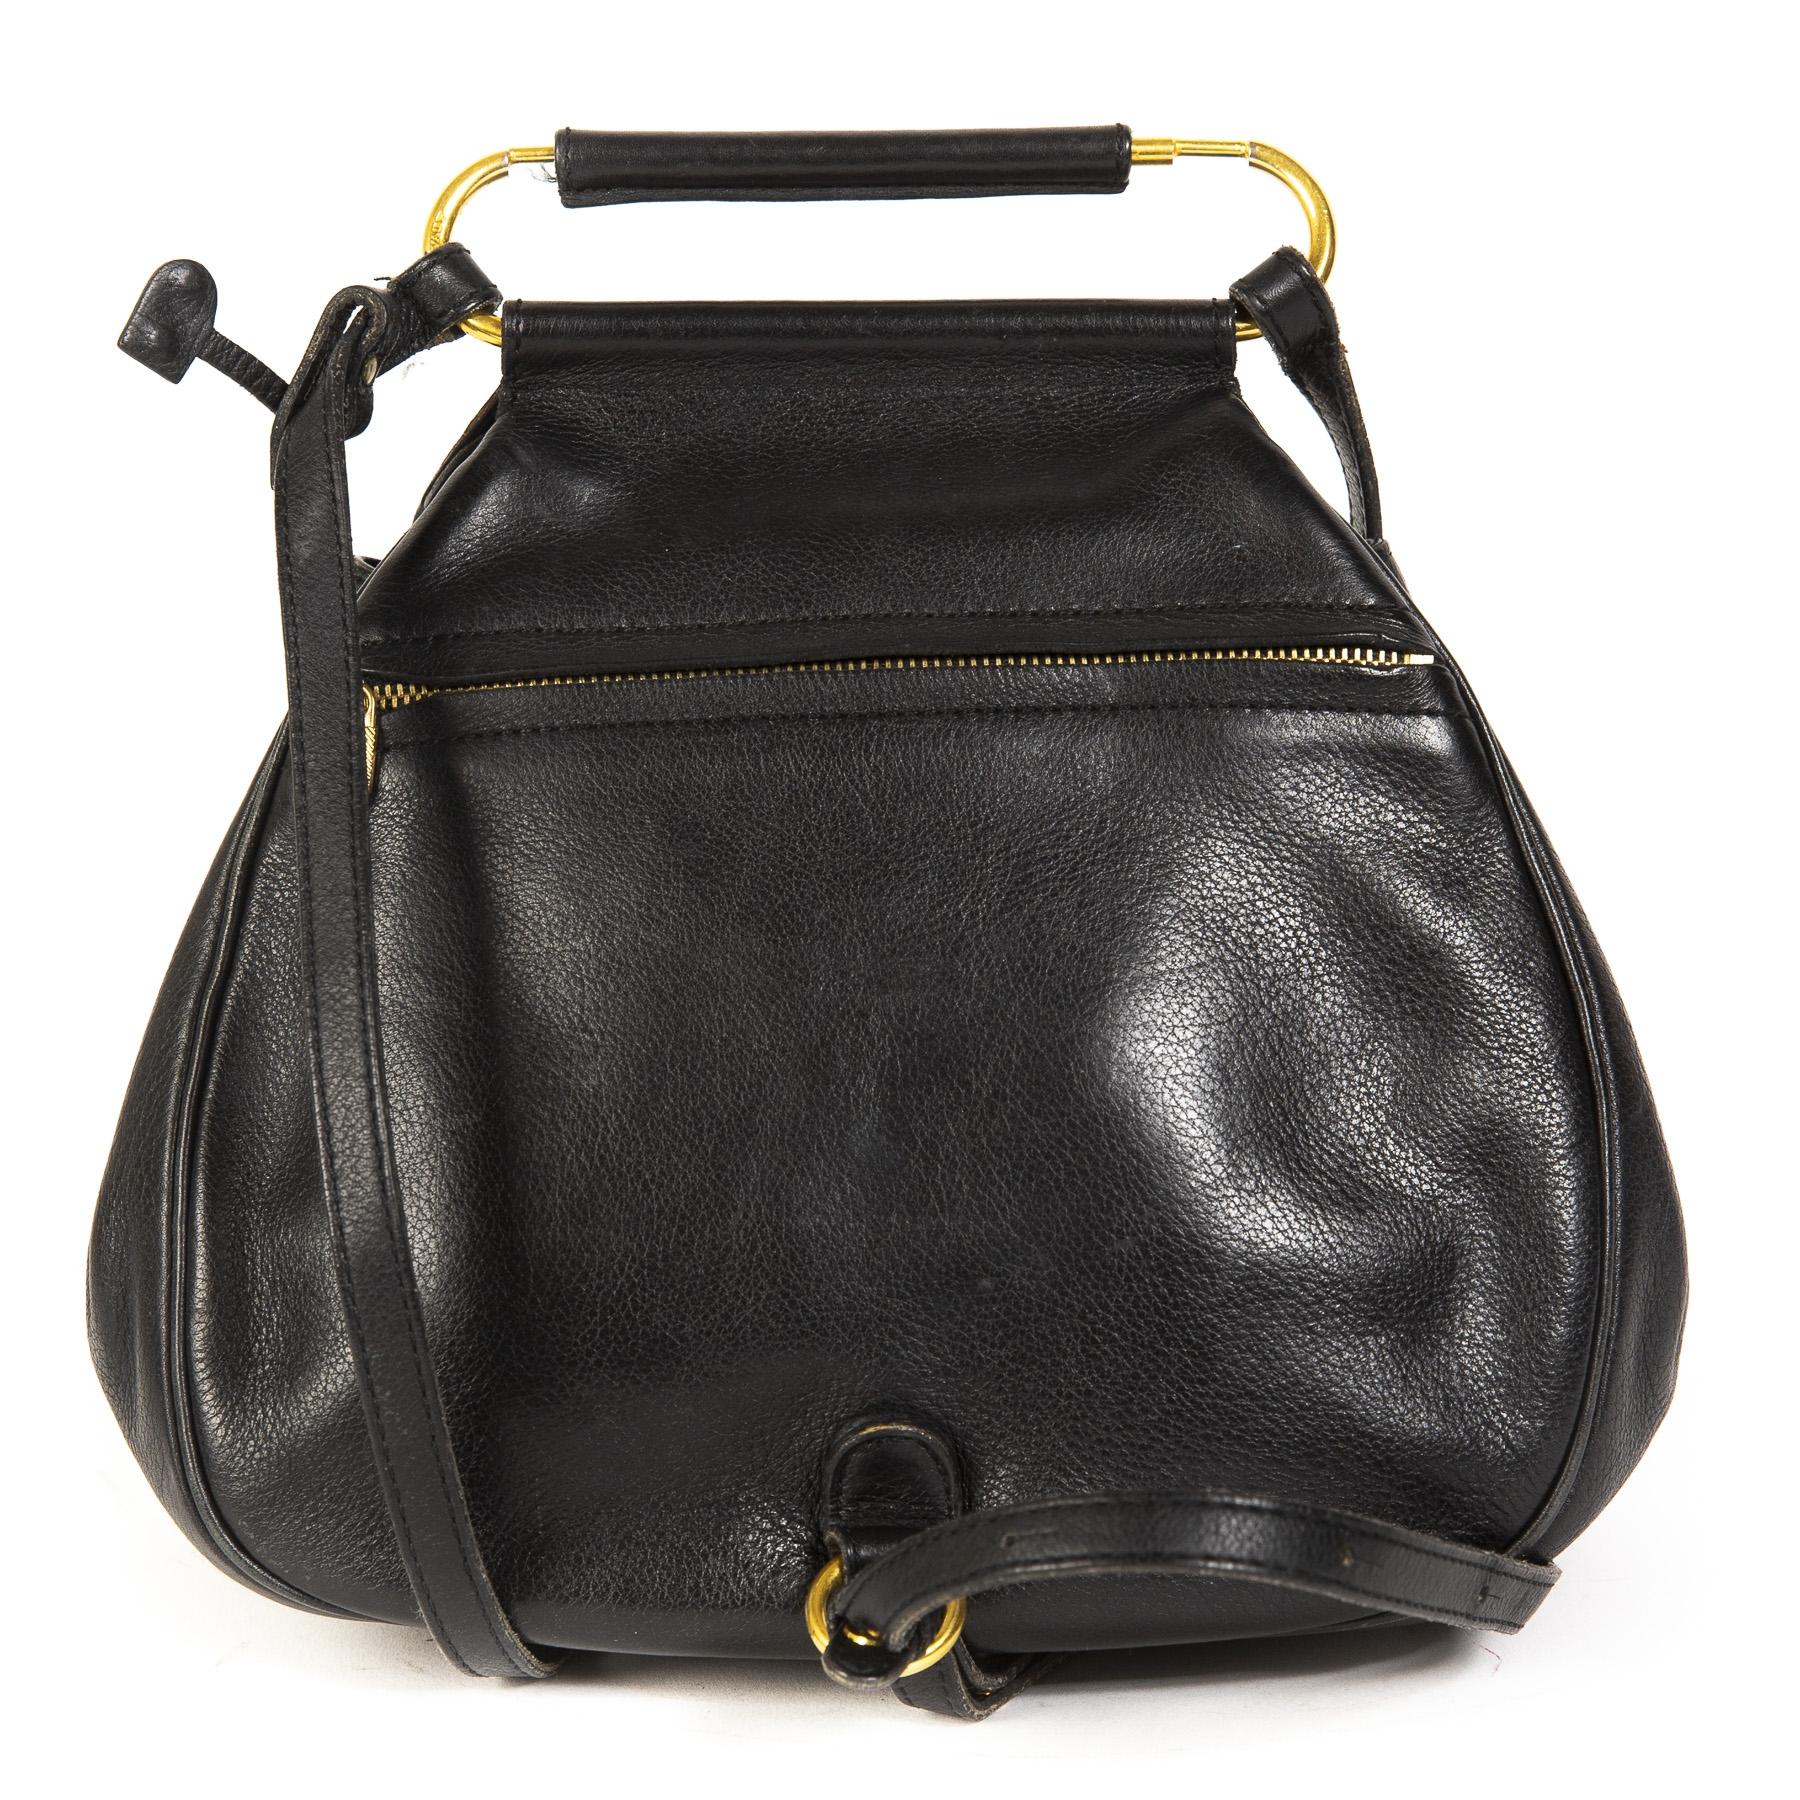 032b28a83f8 Labellov Shop Authentic Vintage Luxury Designer Handbags Online ...